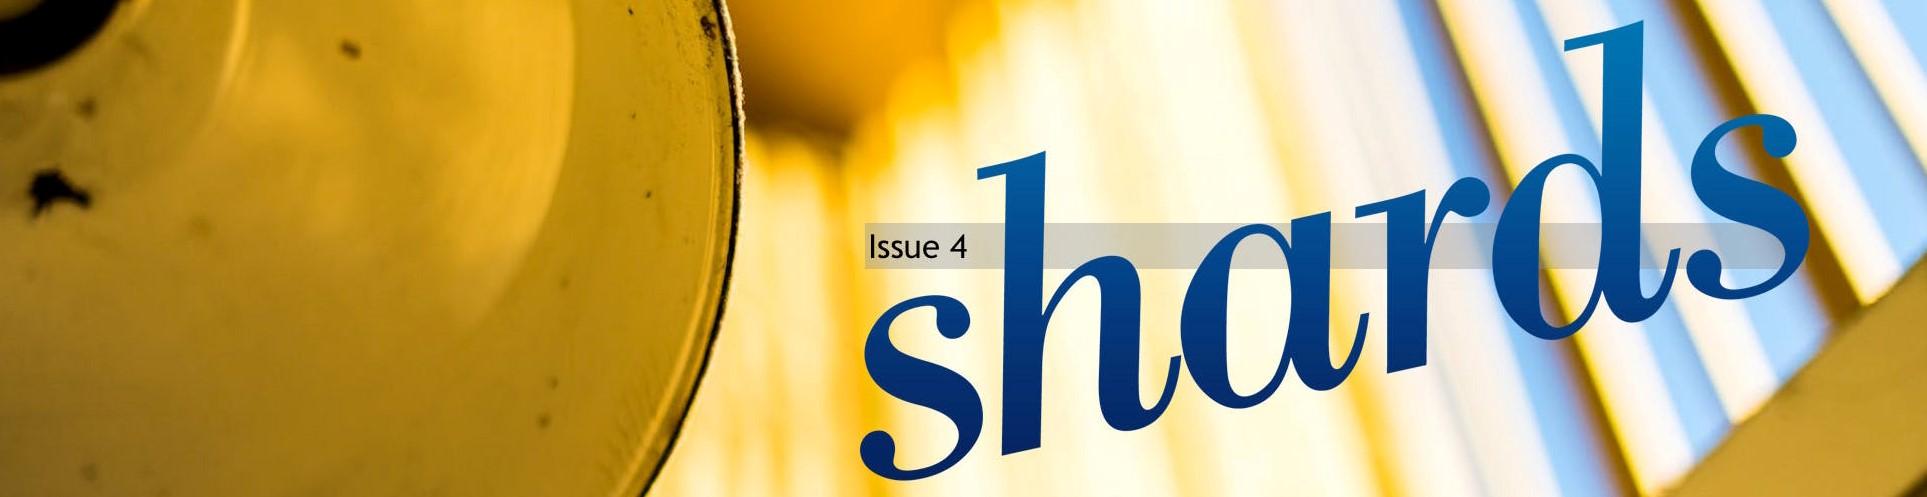 shards glass mountain s online literary magazine glass mountain